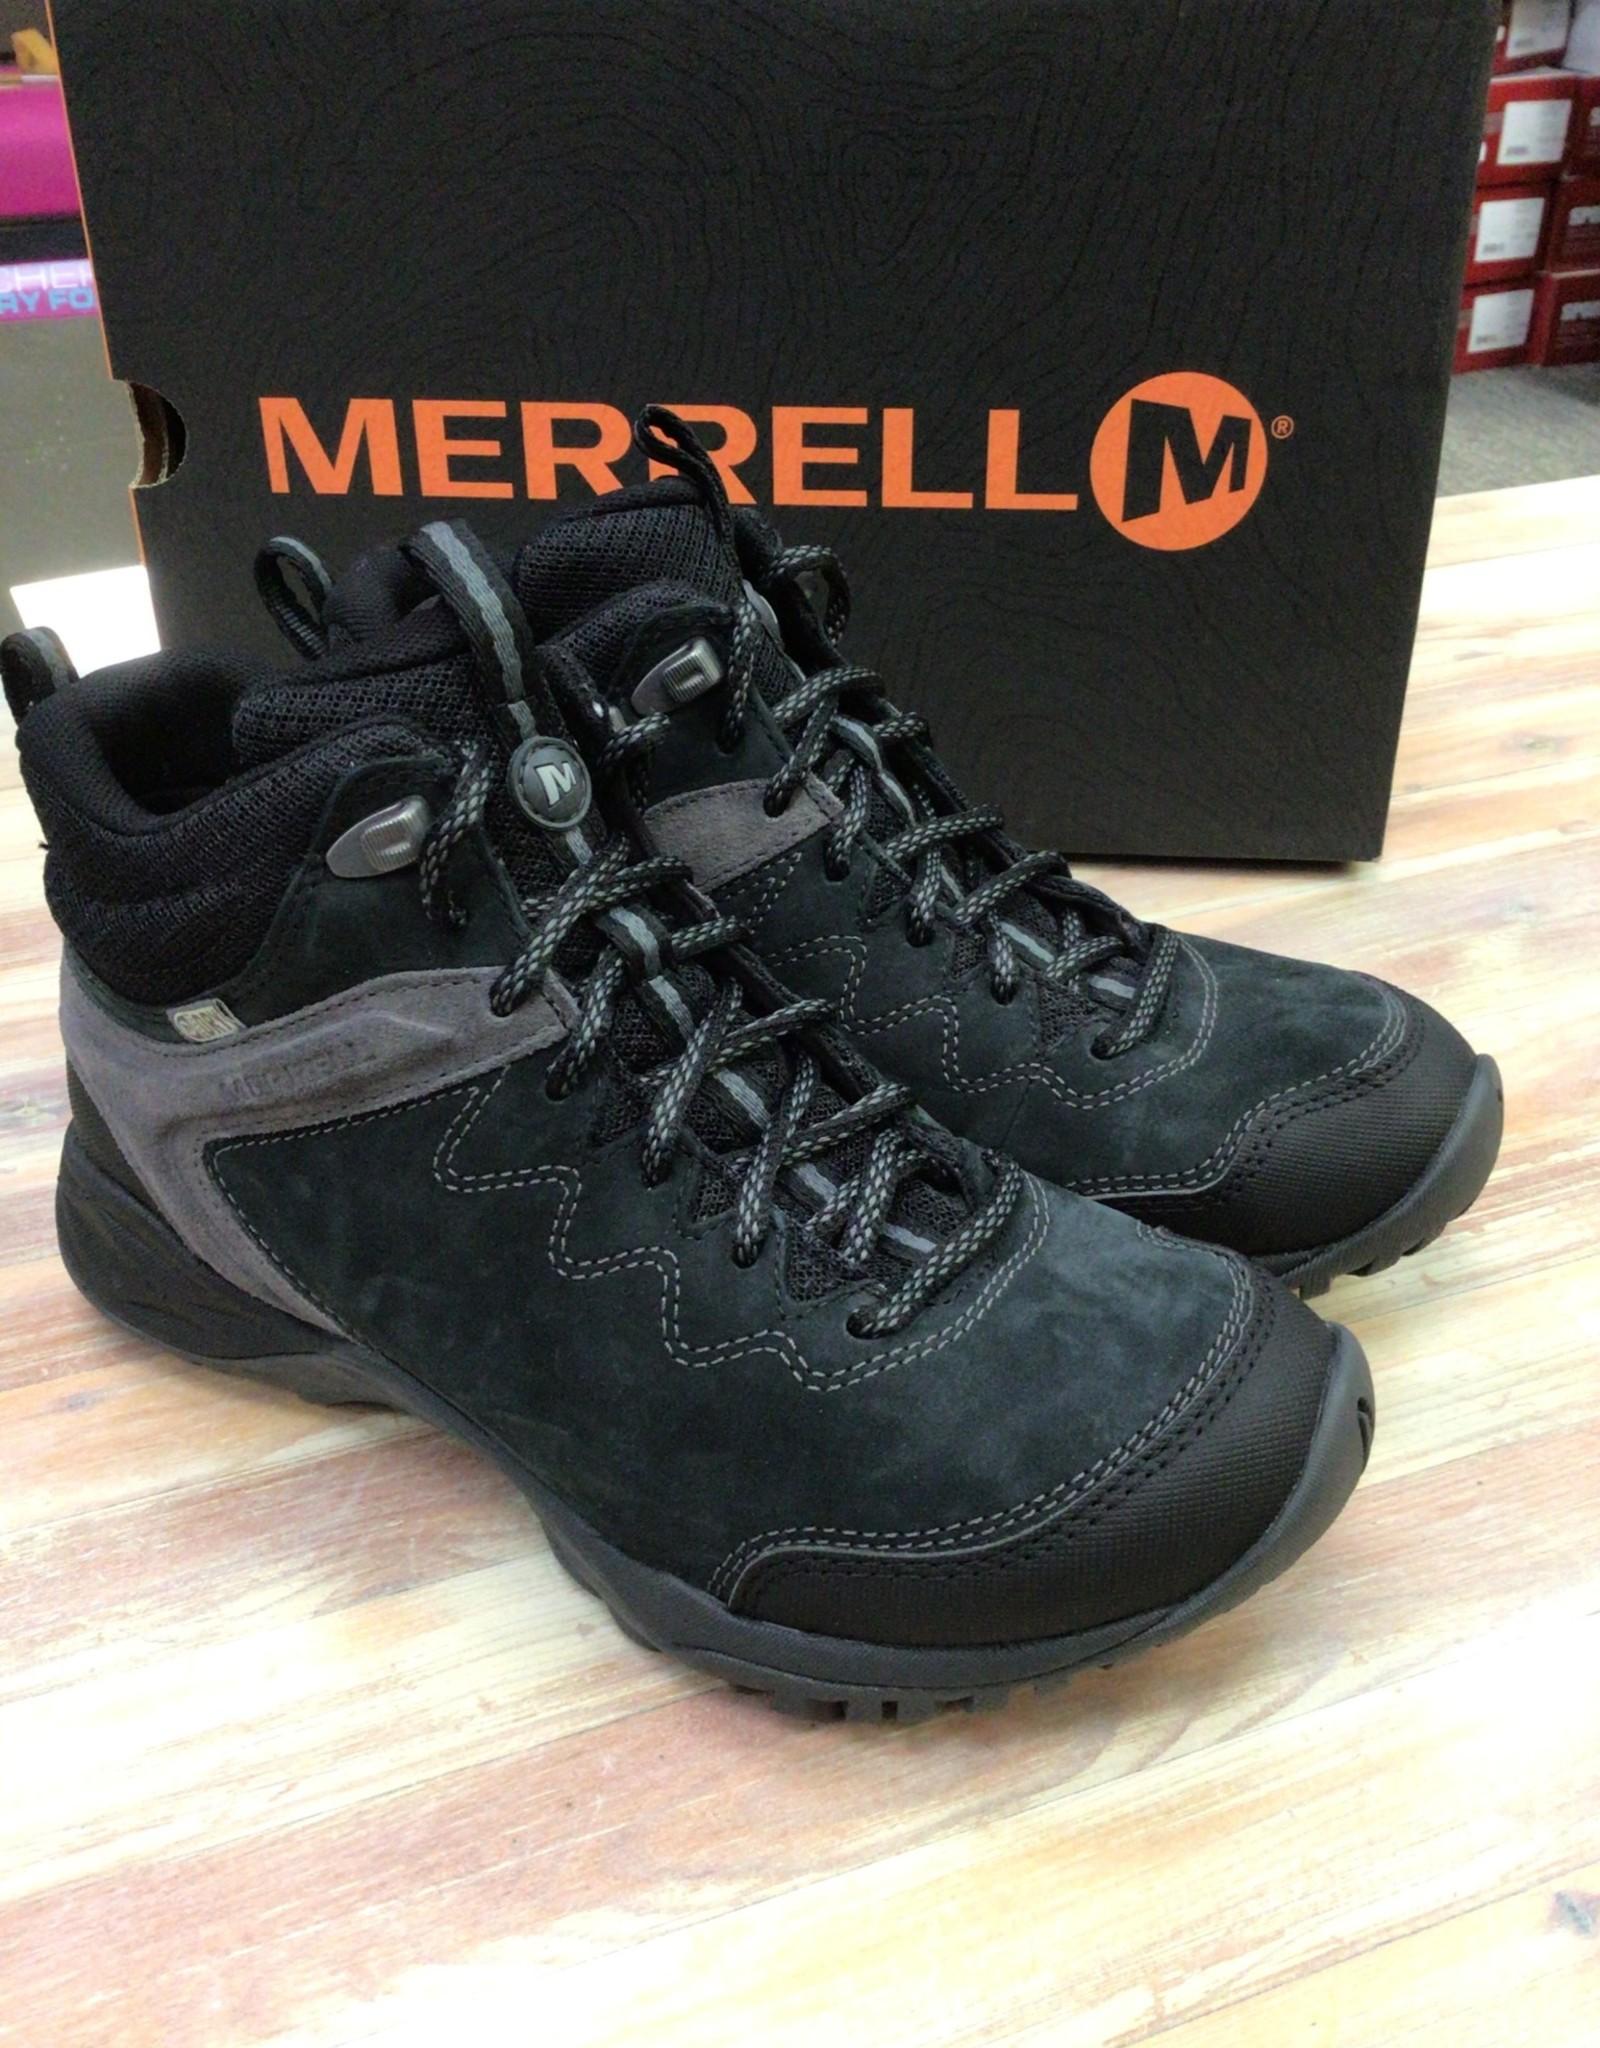 Merrell Merrell Siren Traveller Q2 Mid WP Ladies'